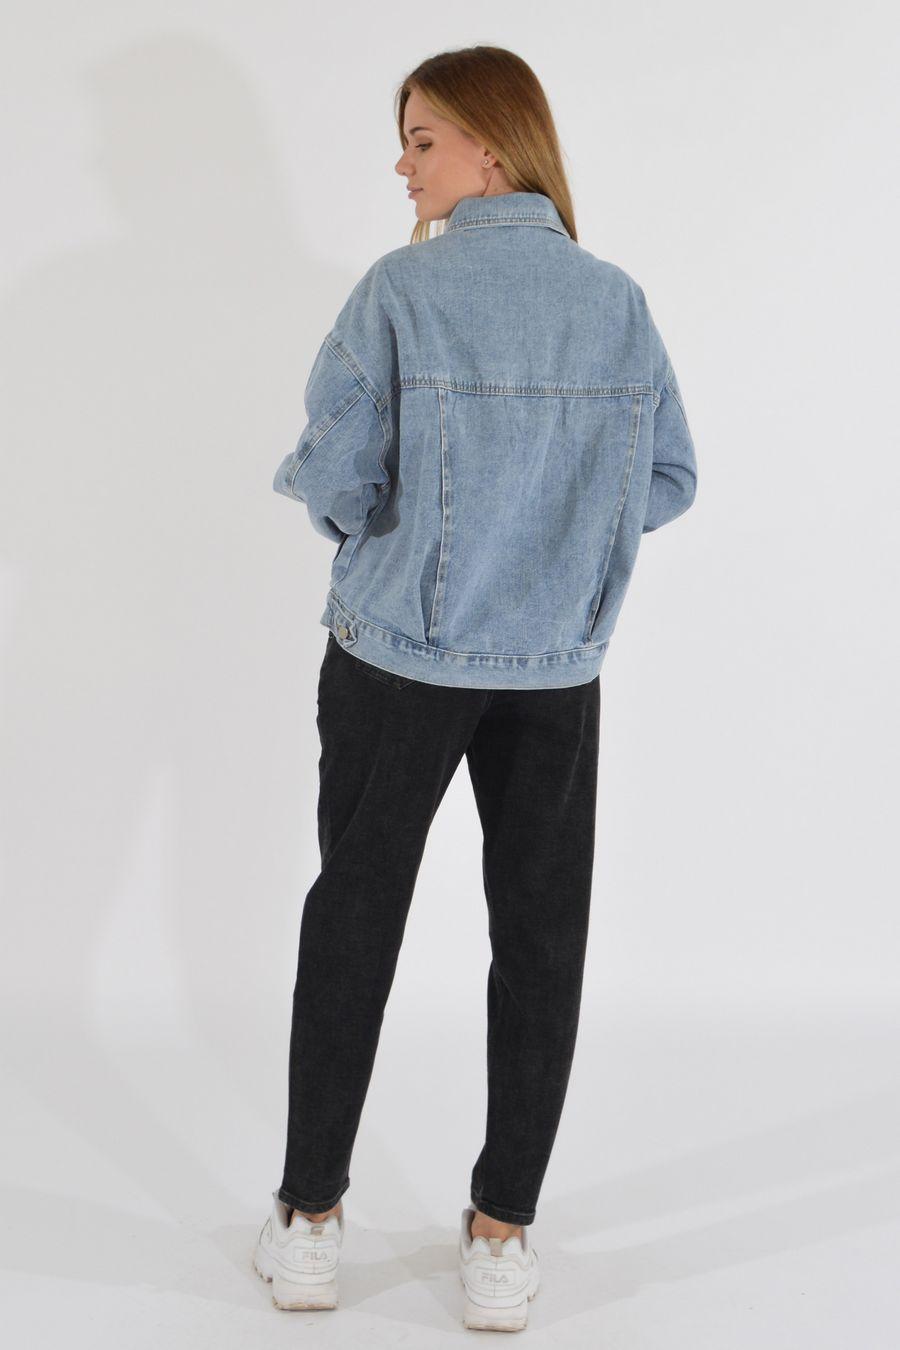 Жакет женский (джинсовка) LRZBS 2189 - фото 4